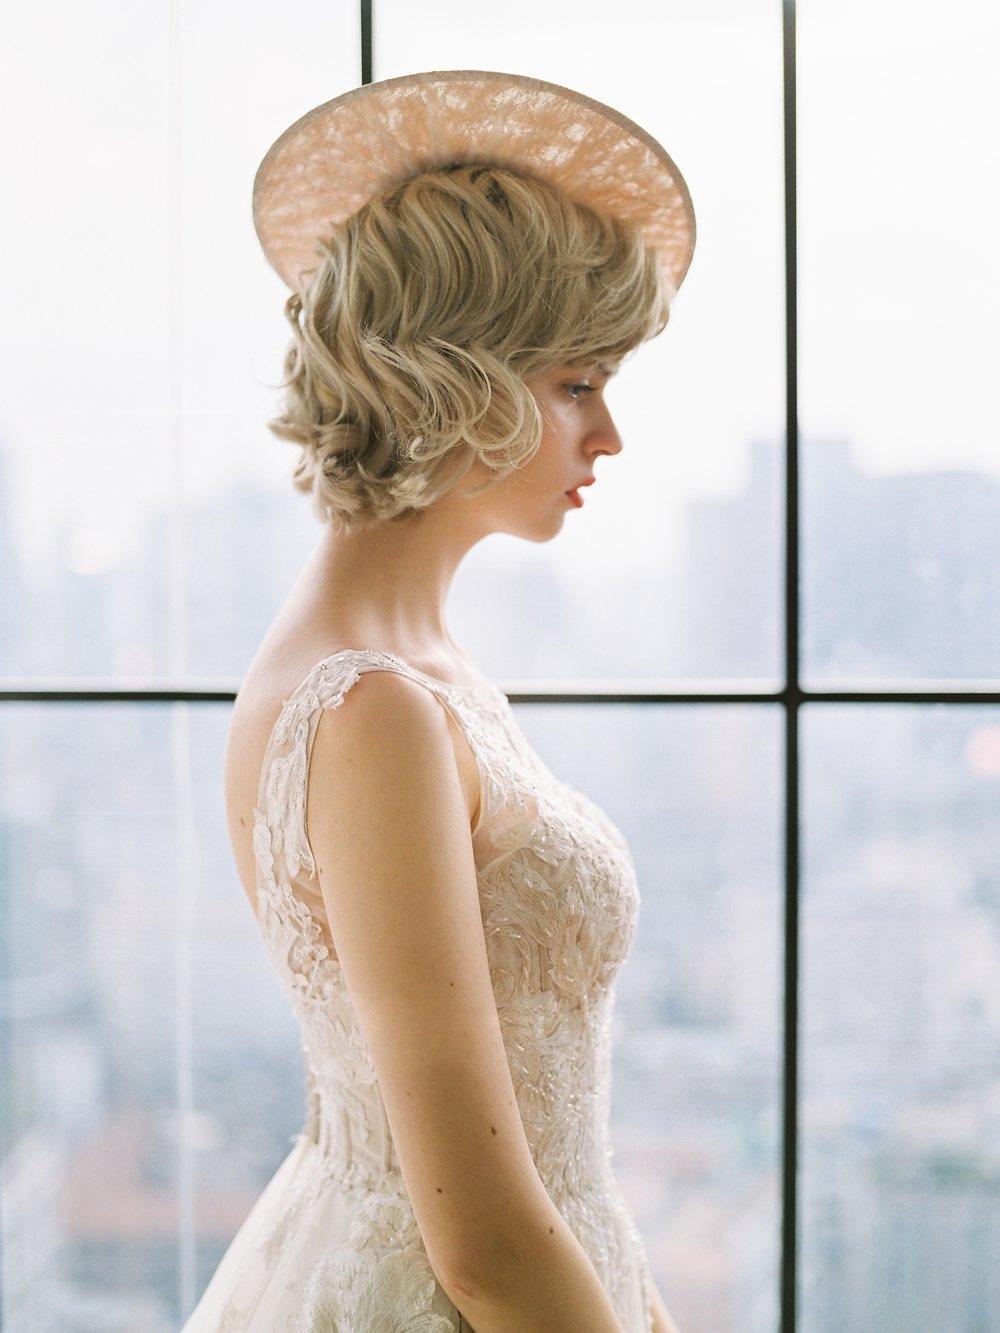 Winter Wedding | Minimalist Bride | White Wedding | Fine Art Wedding | Jin Wed Photography | Fine Art Wedding Blog | Joy Wed | Canadian Wedding Blog